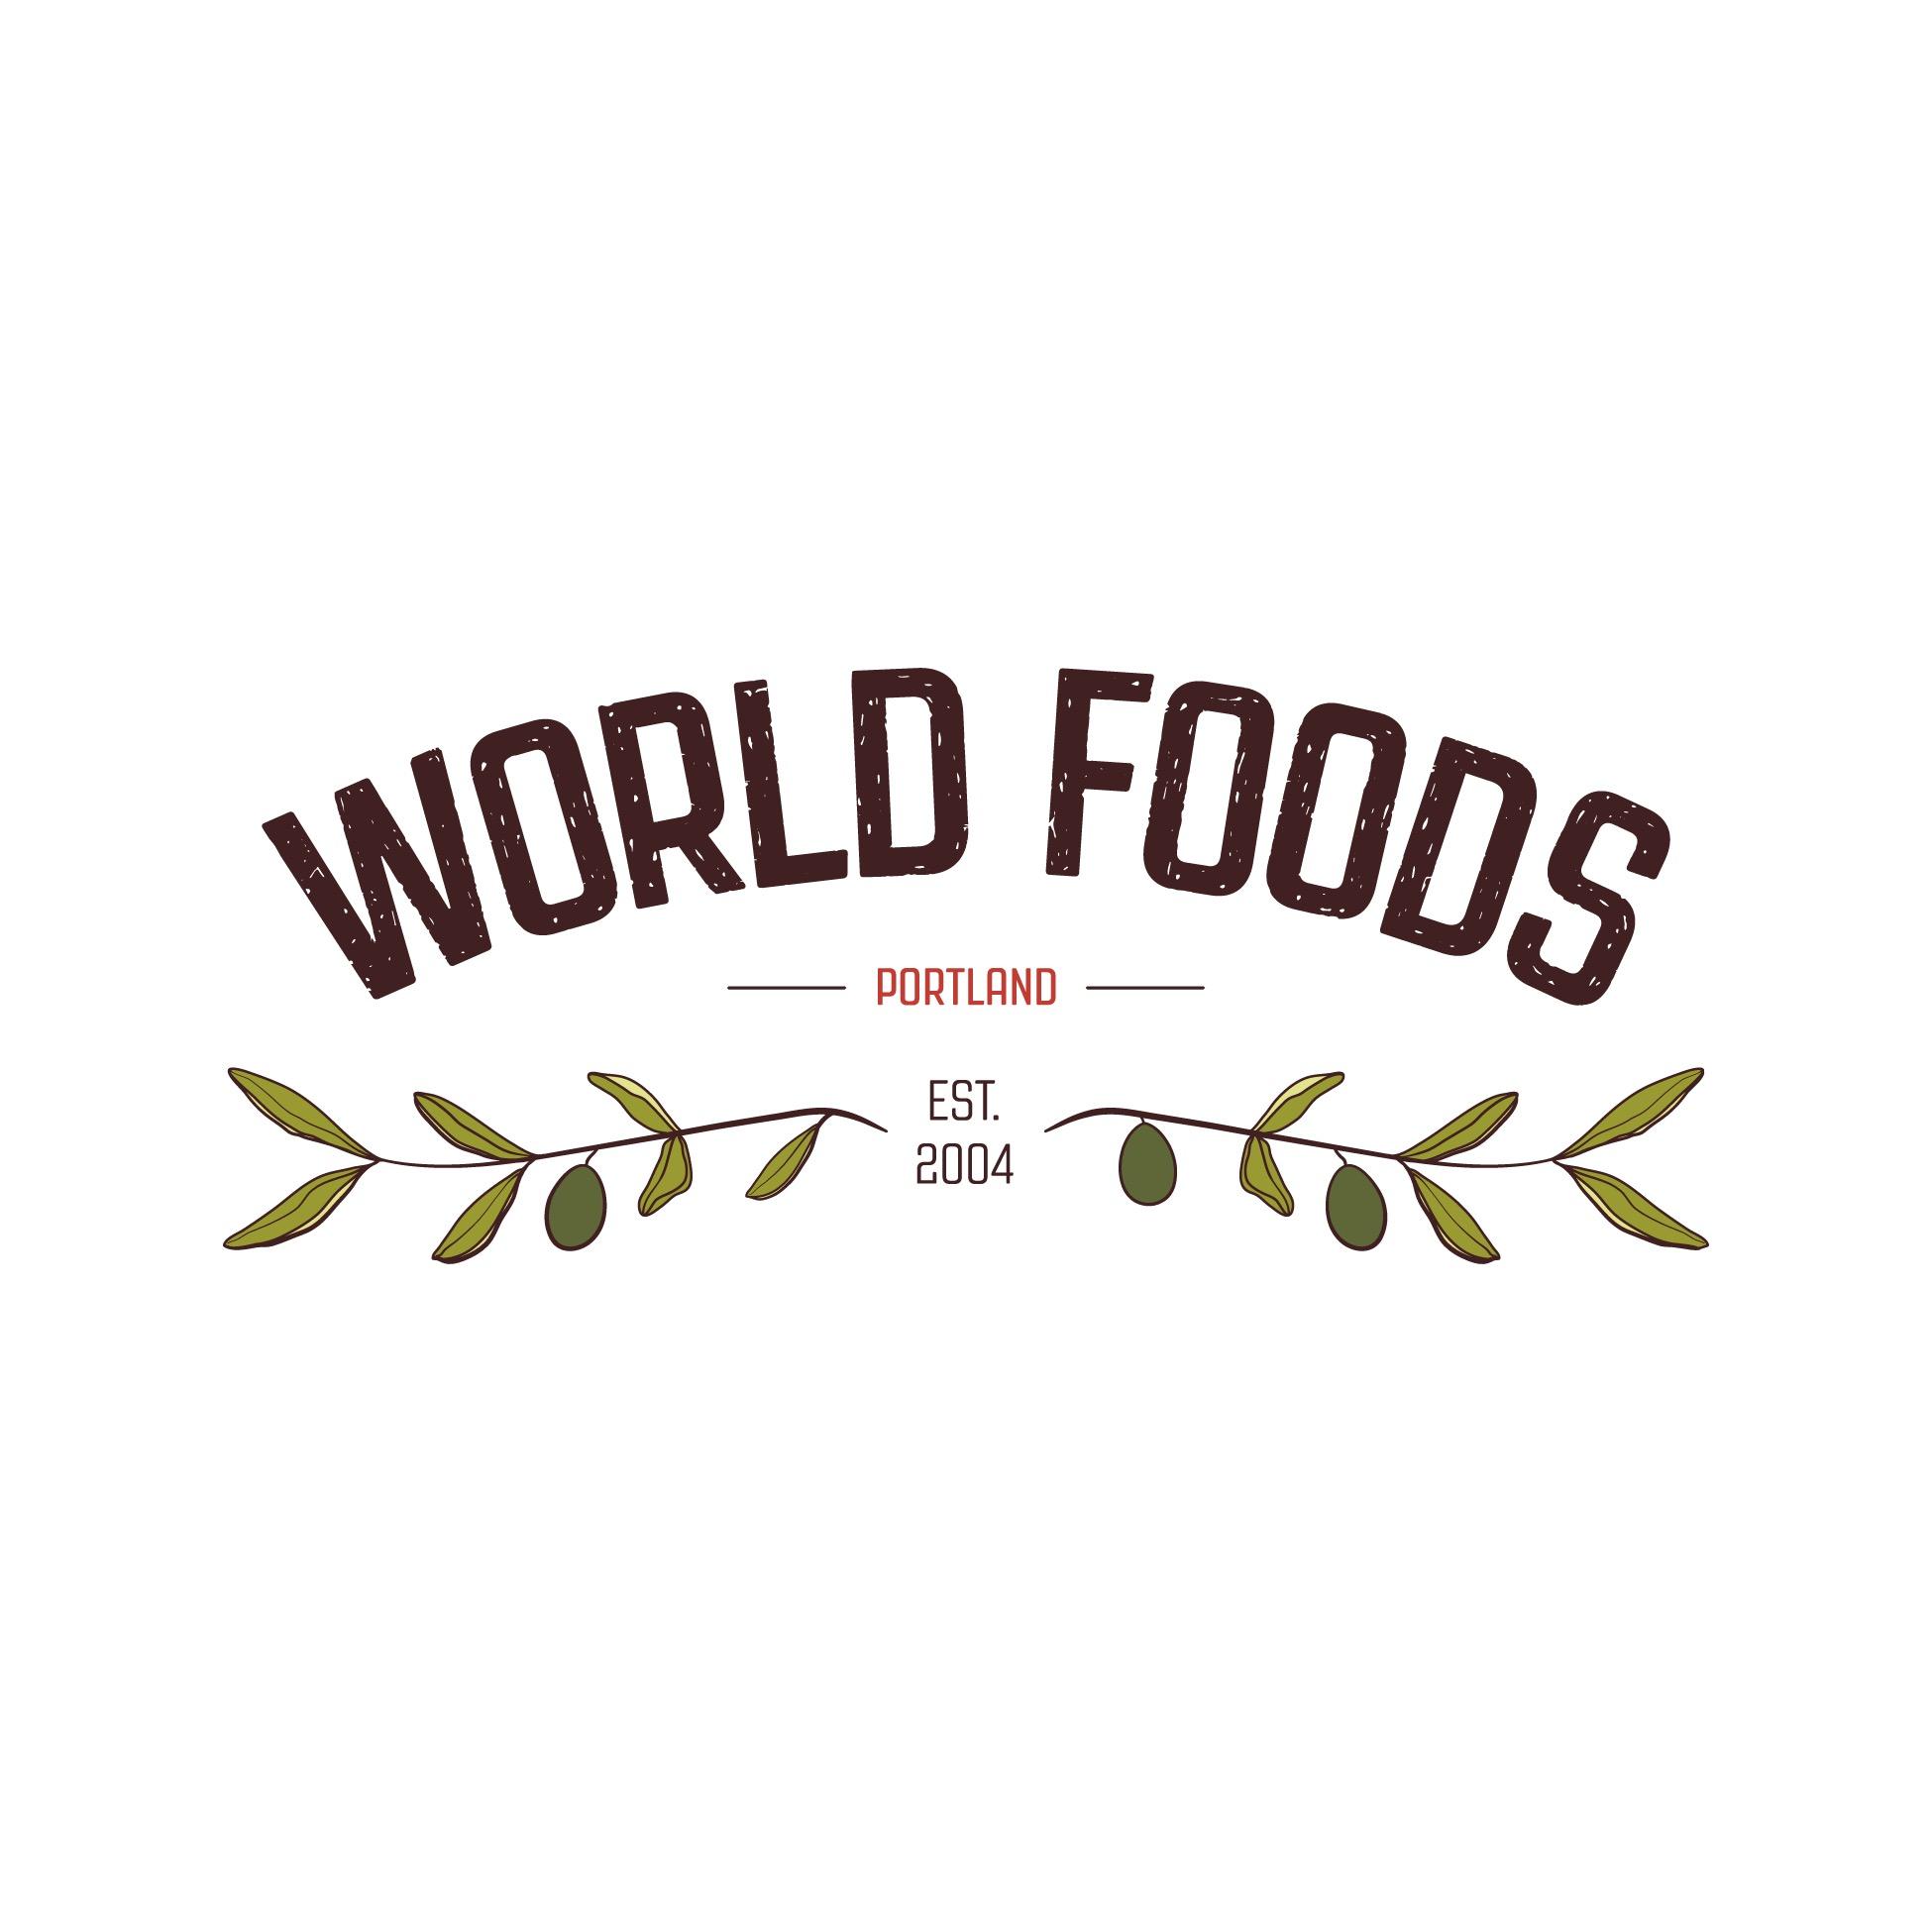 Barbur World Foods logo